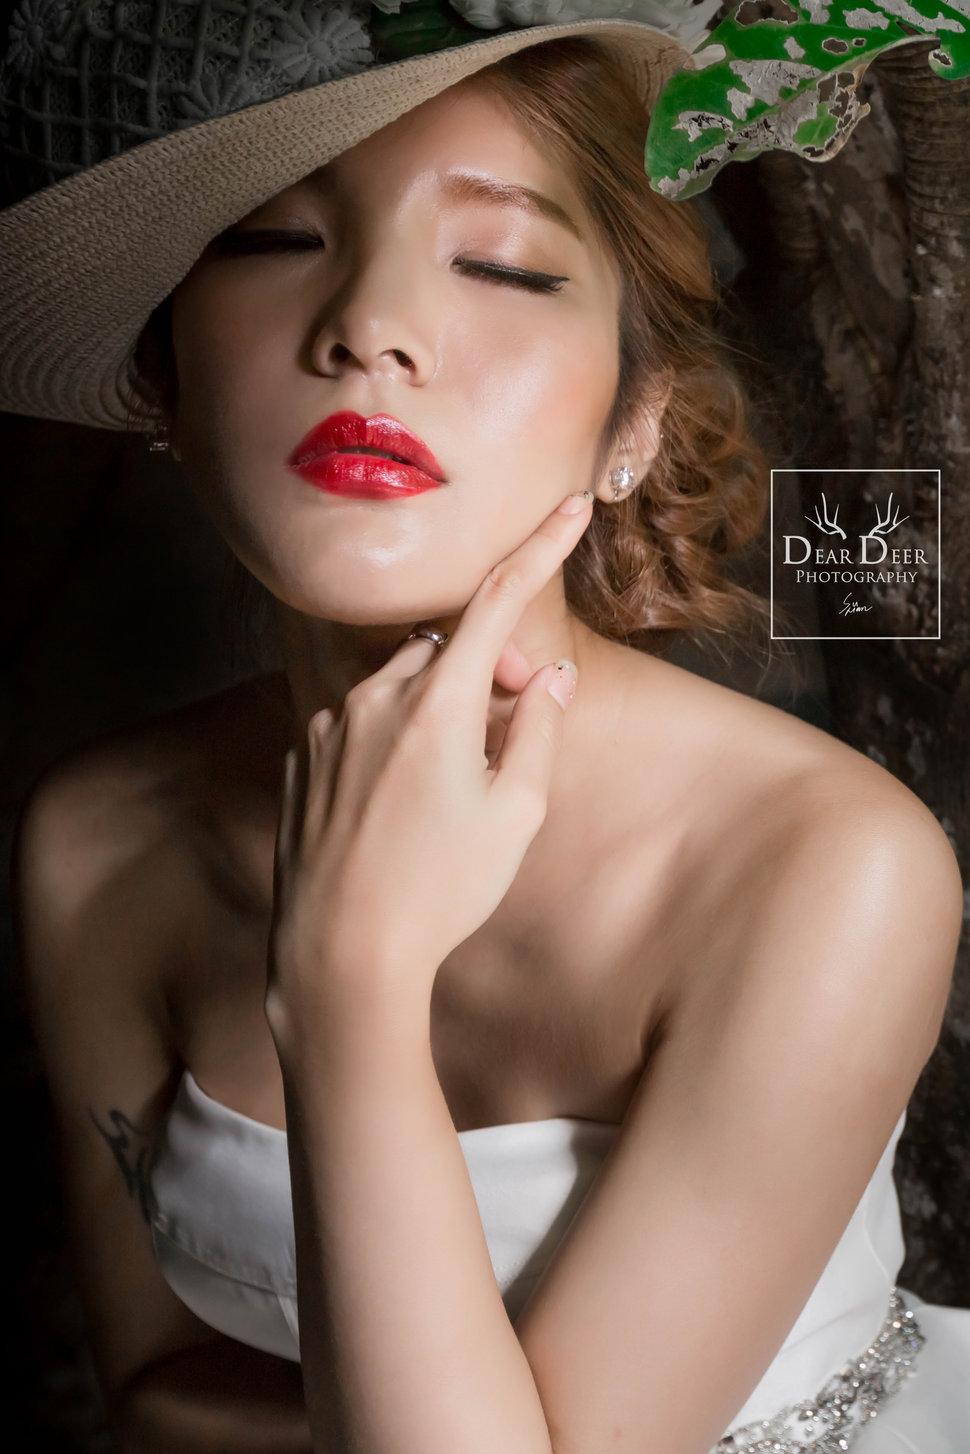 Dear Deer|復古風格(編號:1280560) - Dear Deer鹿兒攝影|女攝影師蘇蔓 - 結婚吧